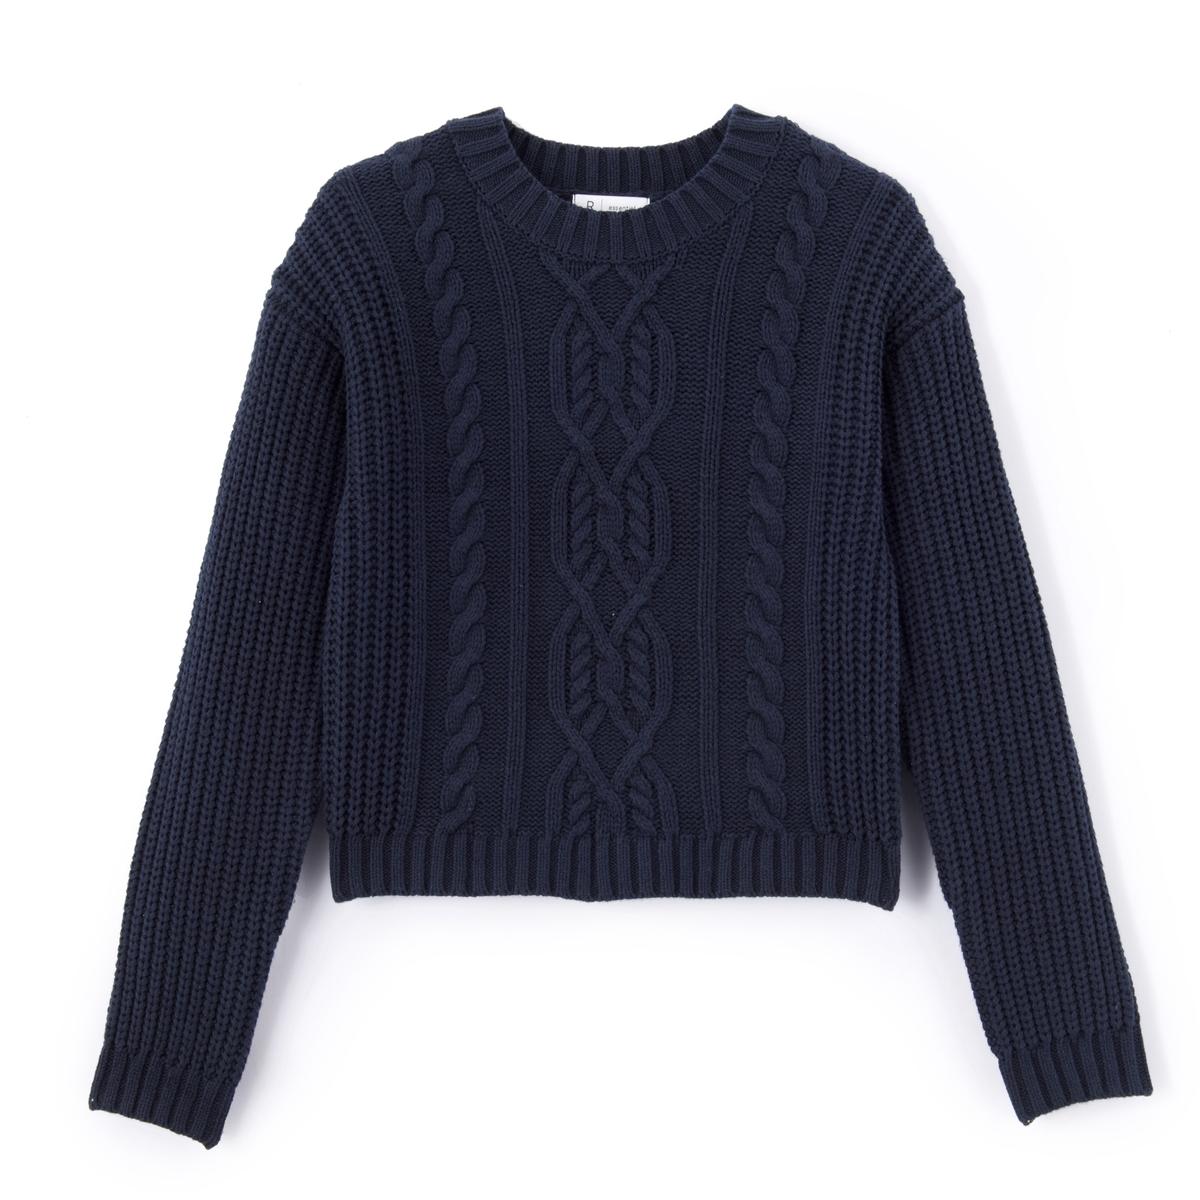 Пуловер с узором косы, 10-16 лет от La Redoute Collections